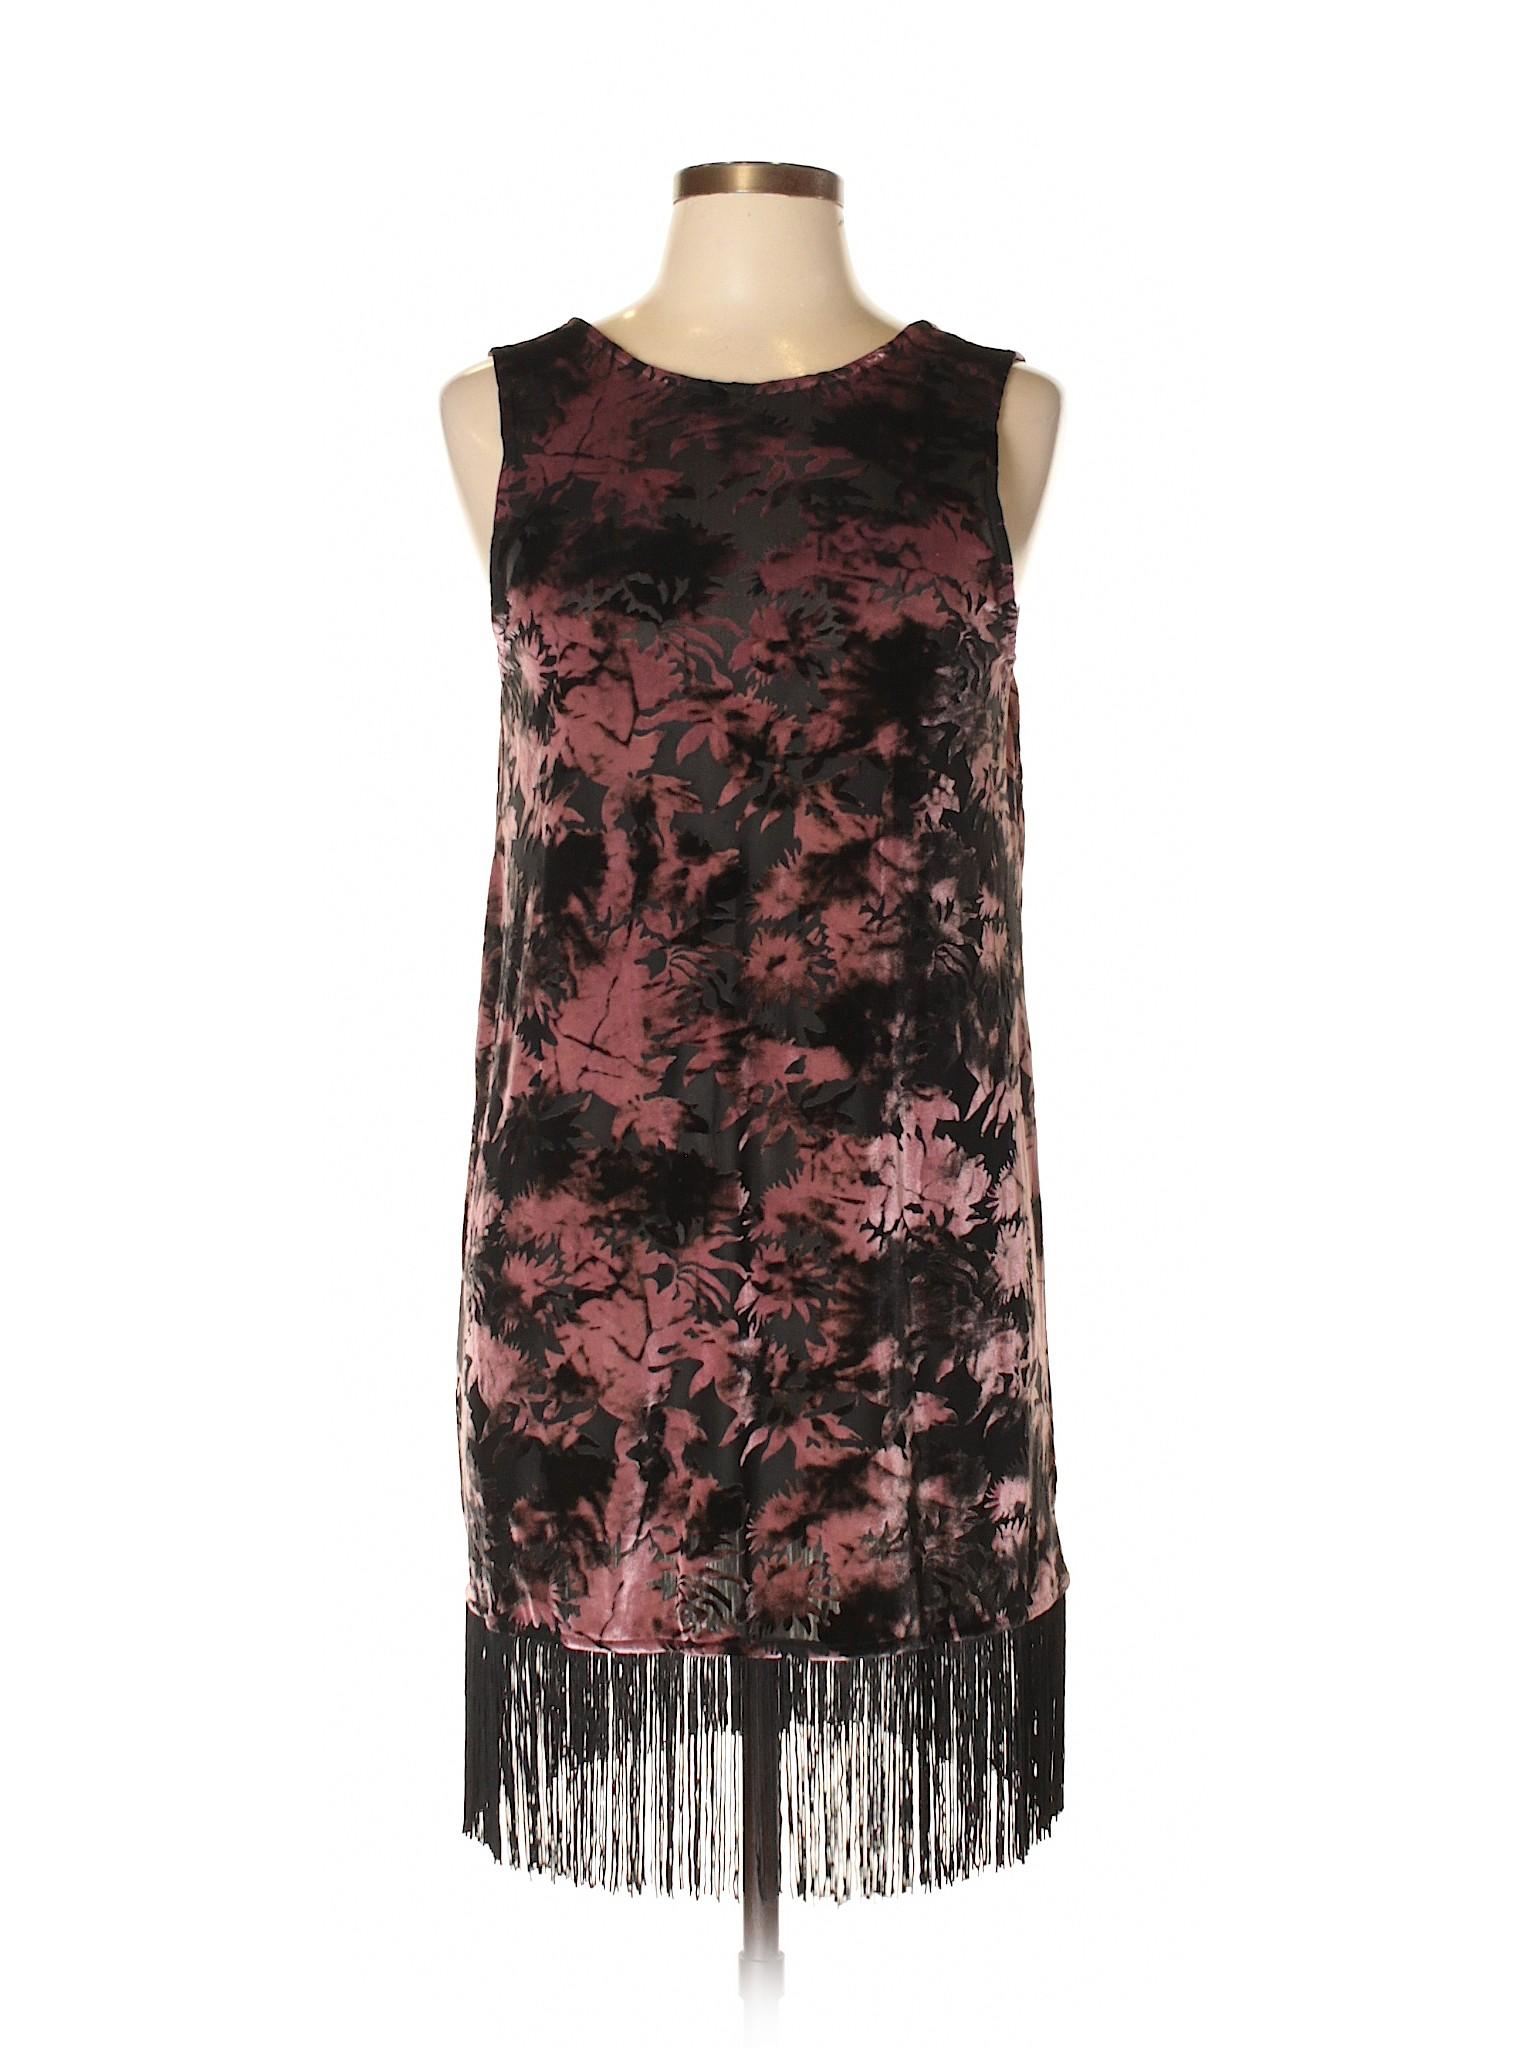 Casual Topshop Boutique winter Boutique Dress winter qwT7I1